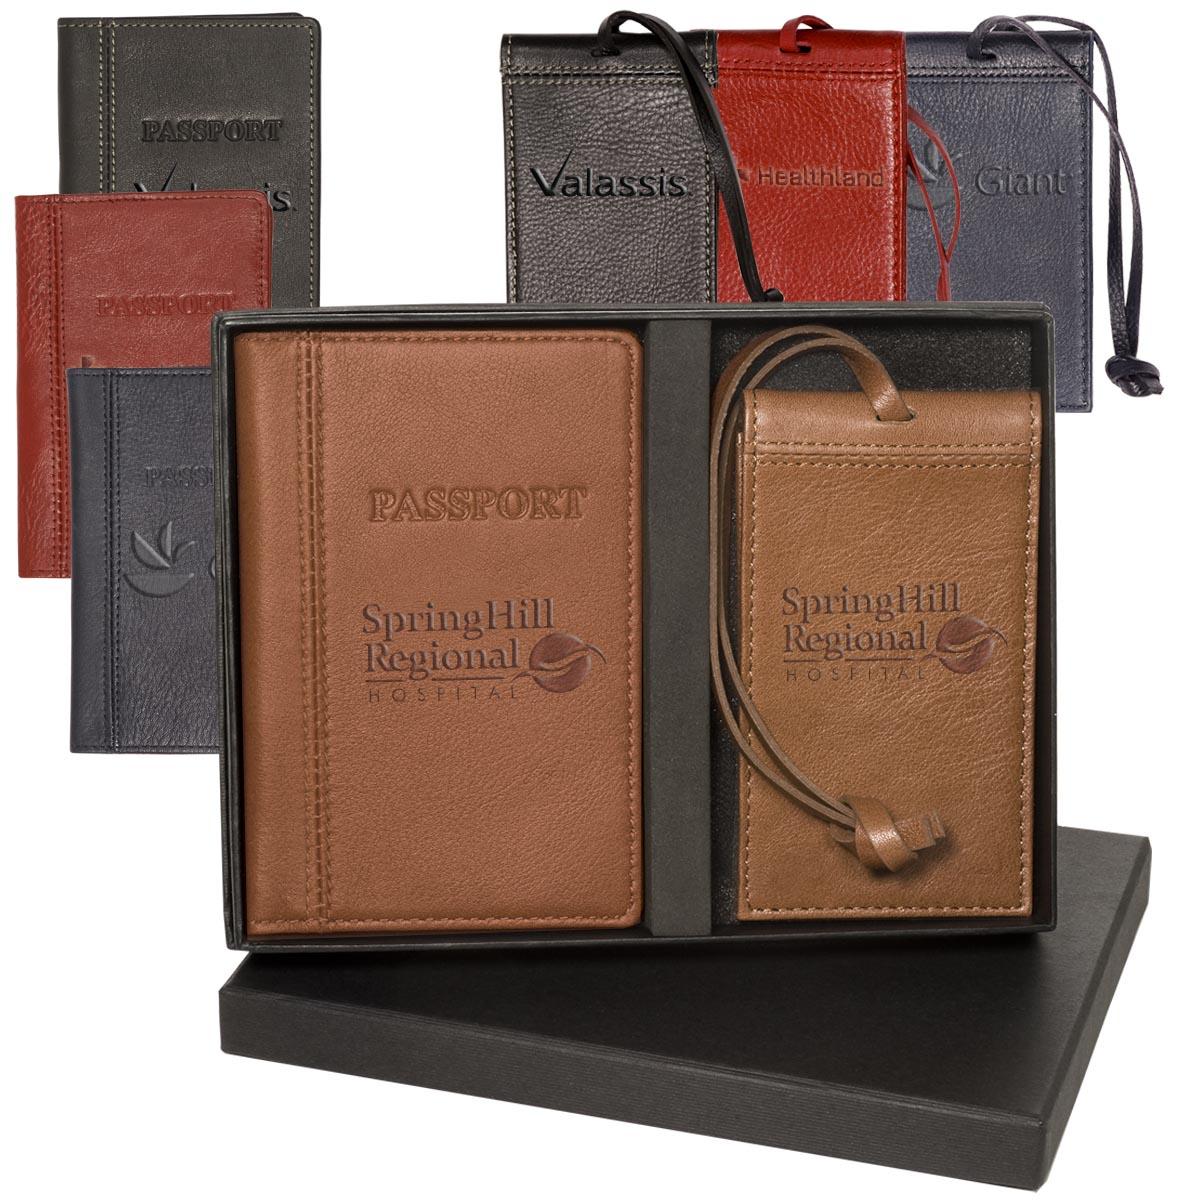 Voyager Lloyd Harbor Passport & Magnetic Luggage Tag Set